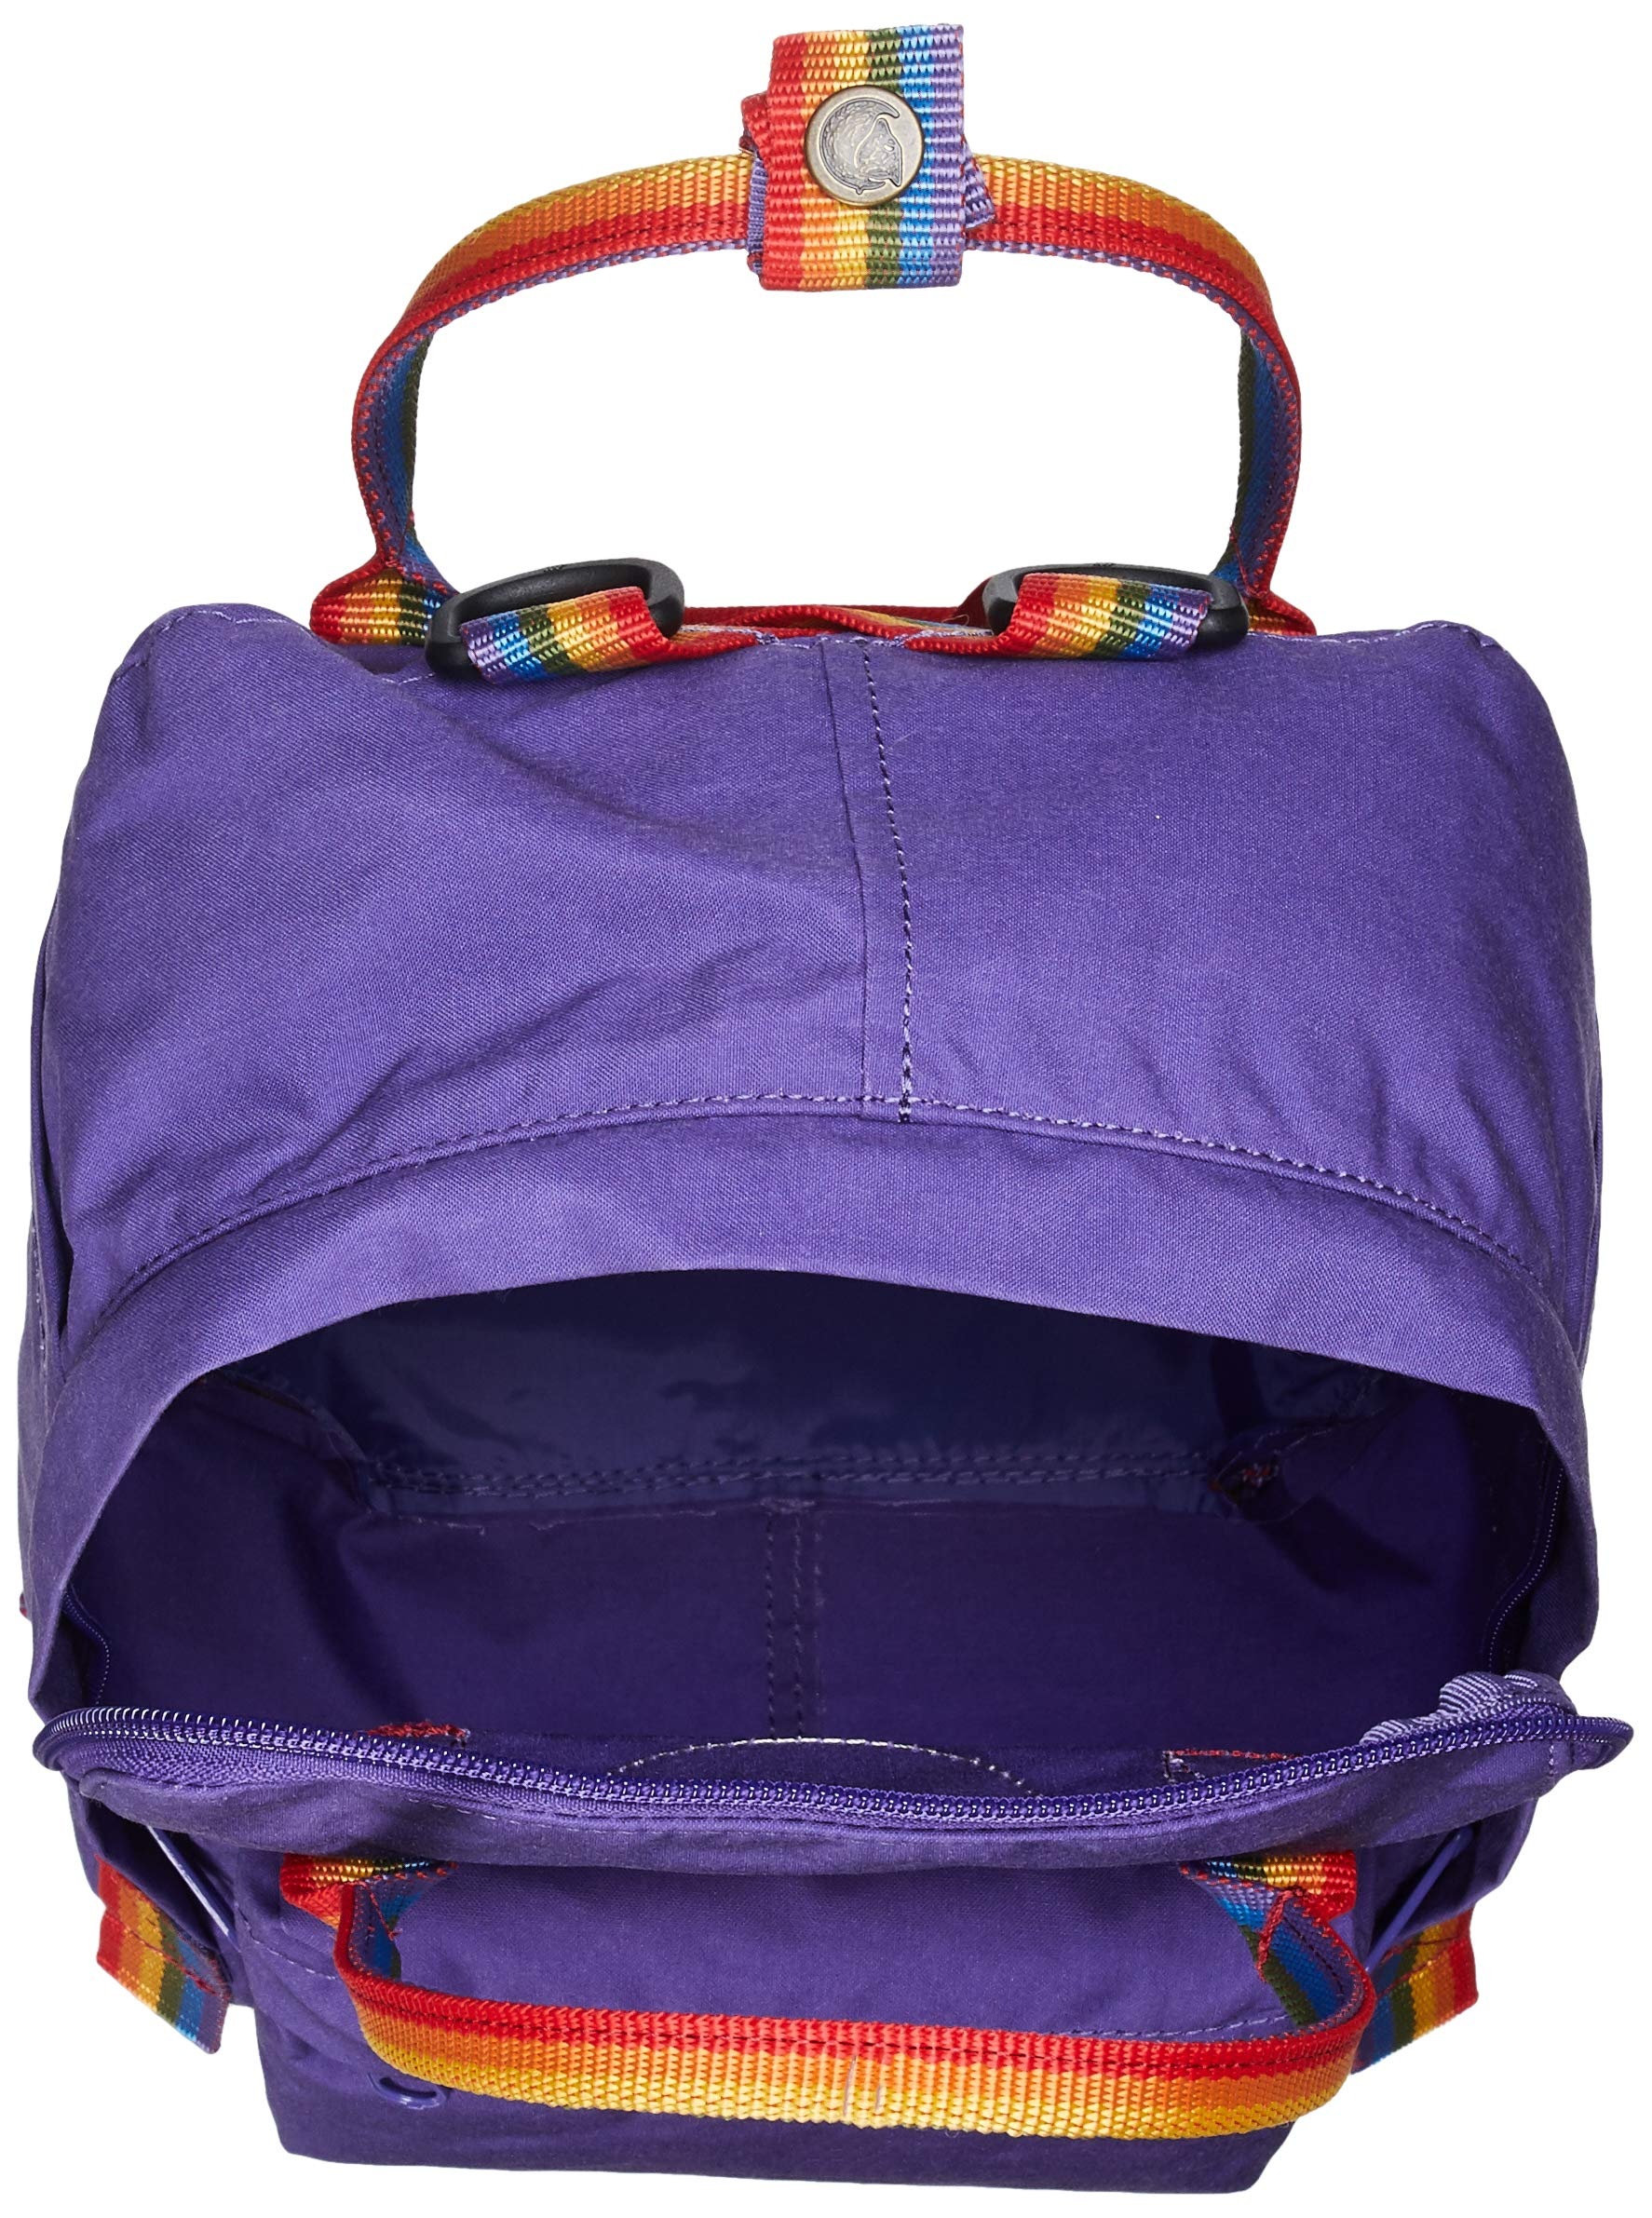 919sSSVHtvL - FJALLRAVEN Kånken Mini Mochila, Unisex Adulto, (Purple/Rainbow Pattern), Talla Única